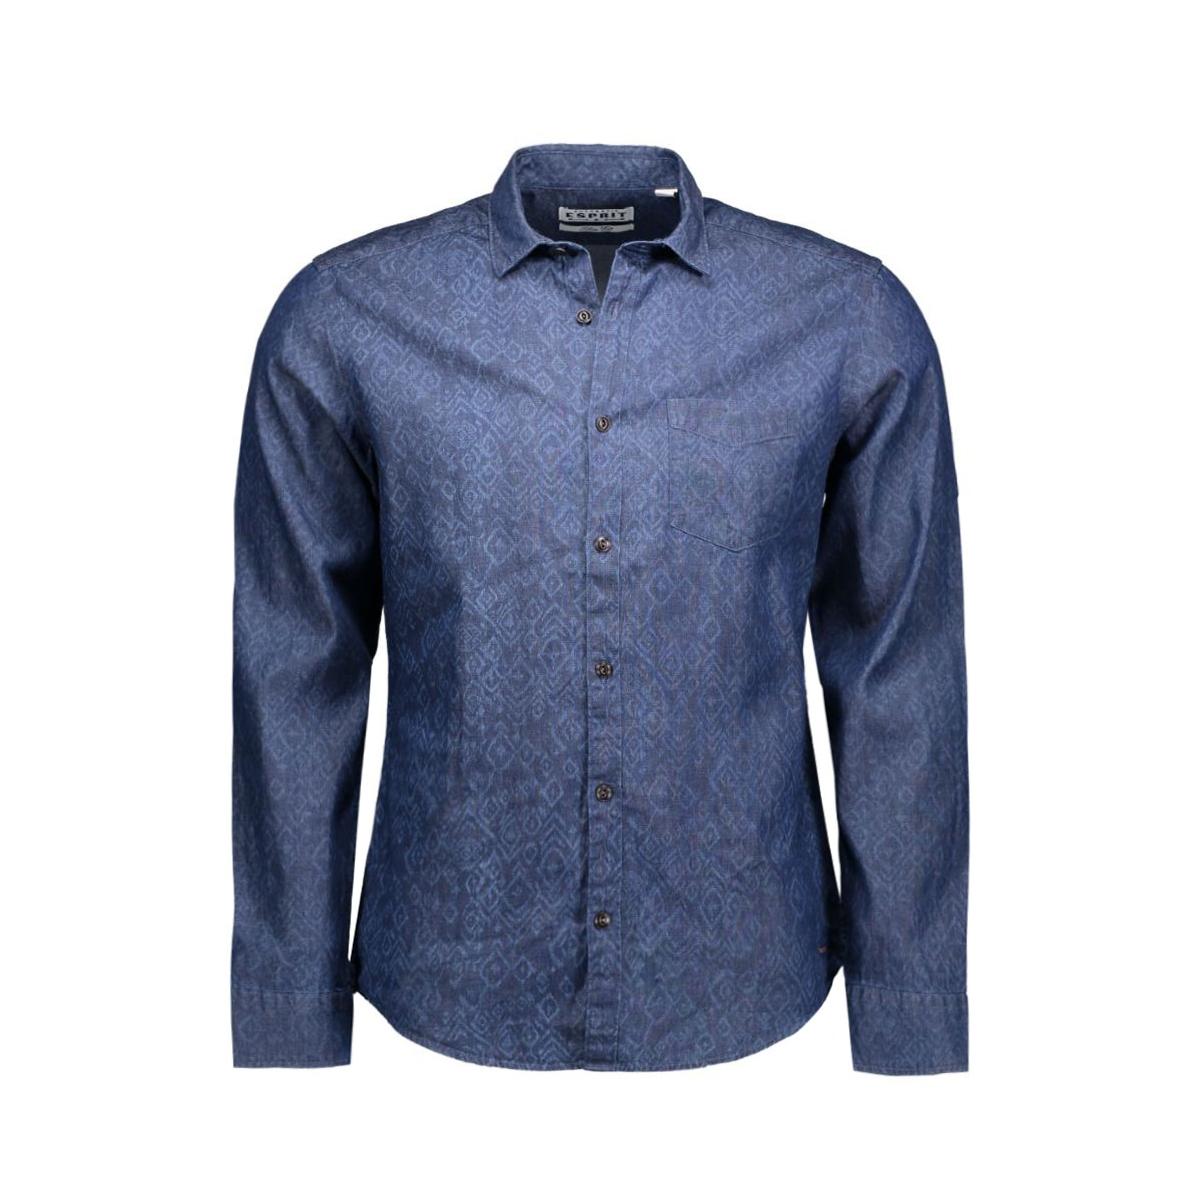 086ee2f029 esprit overhemd e400